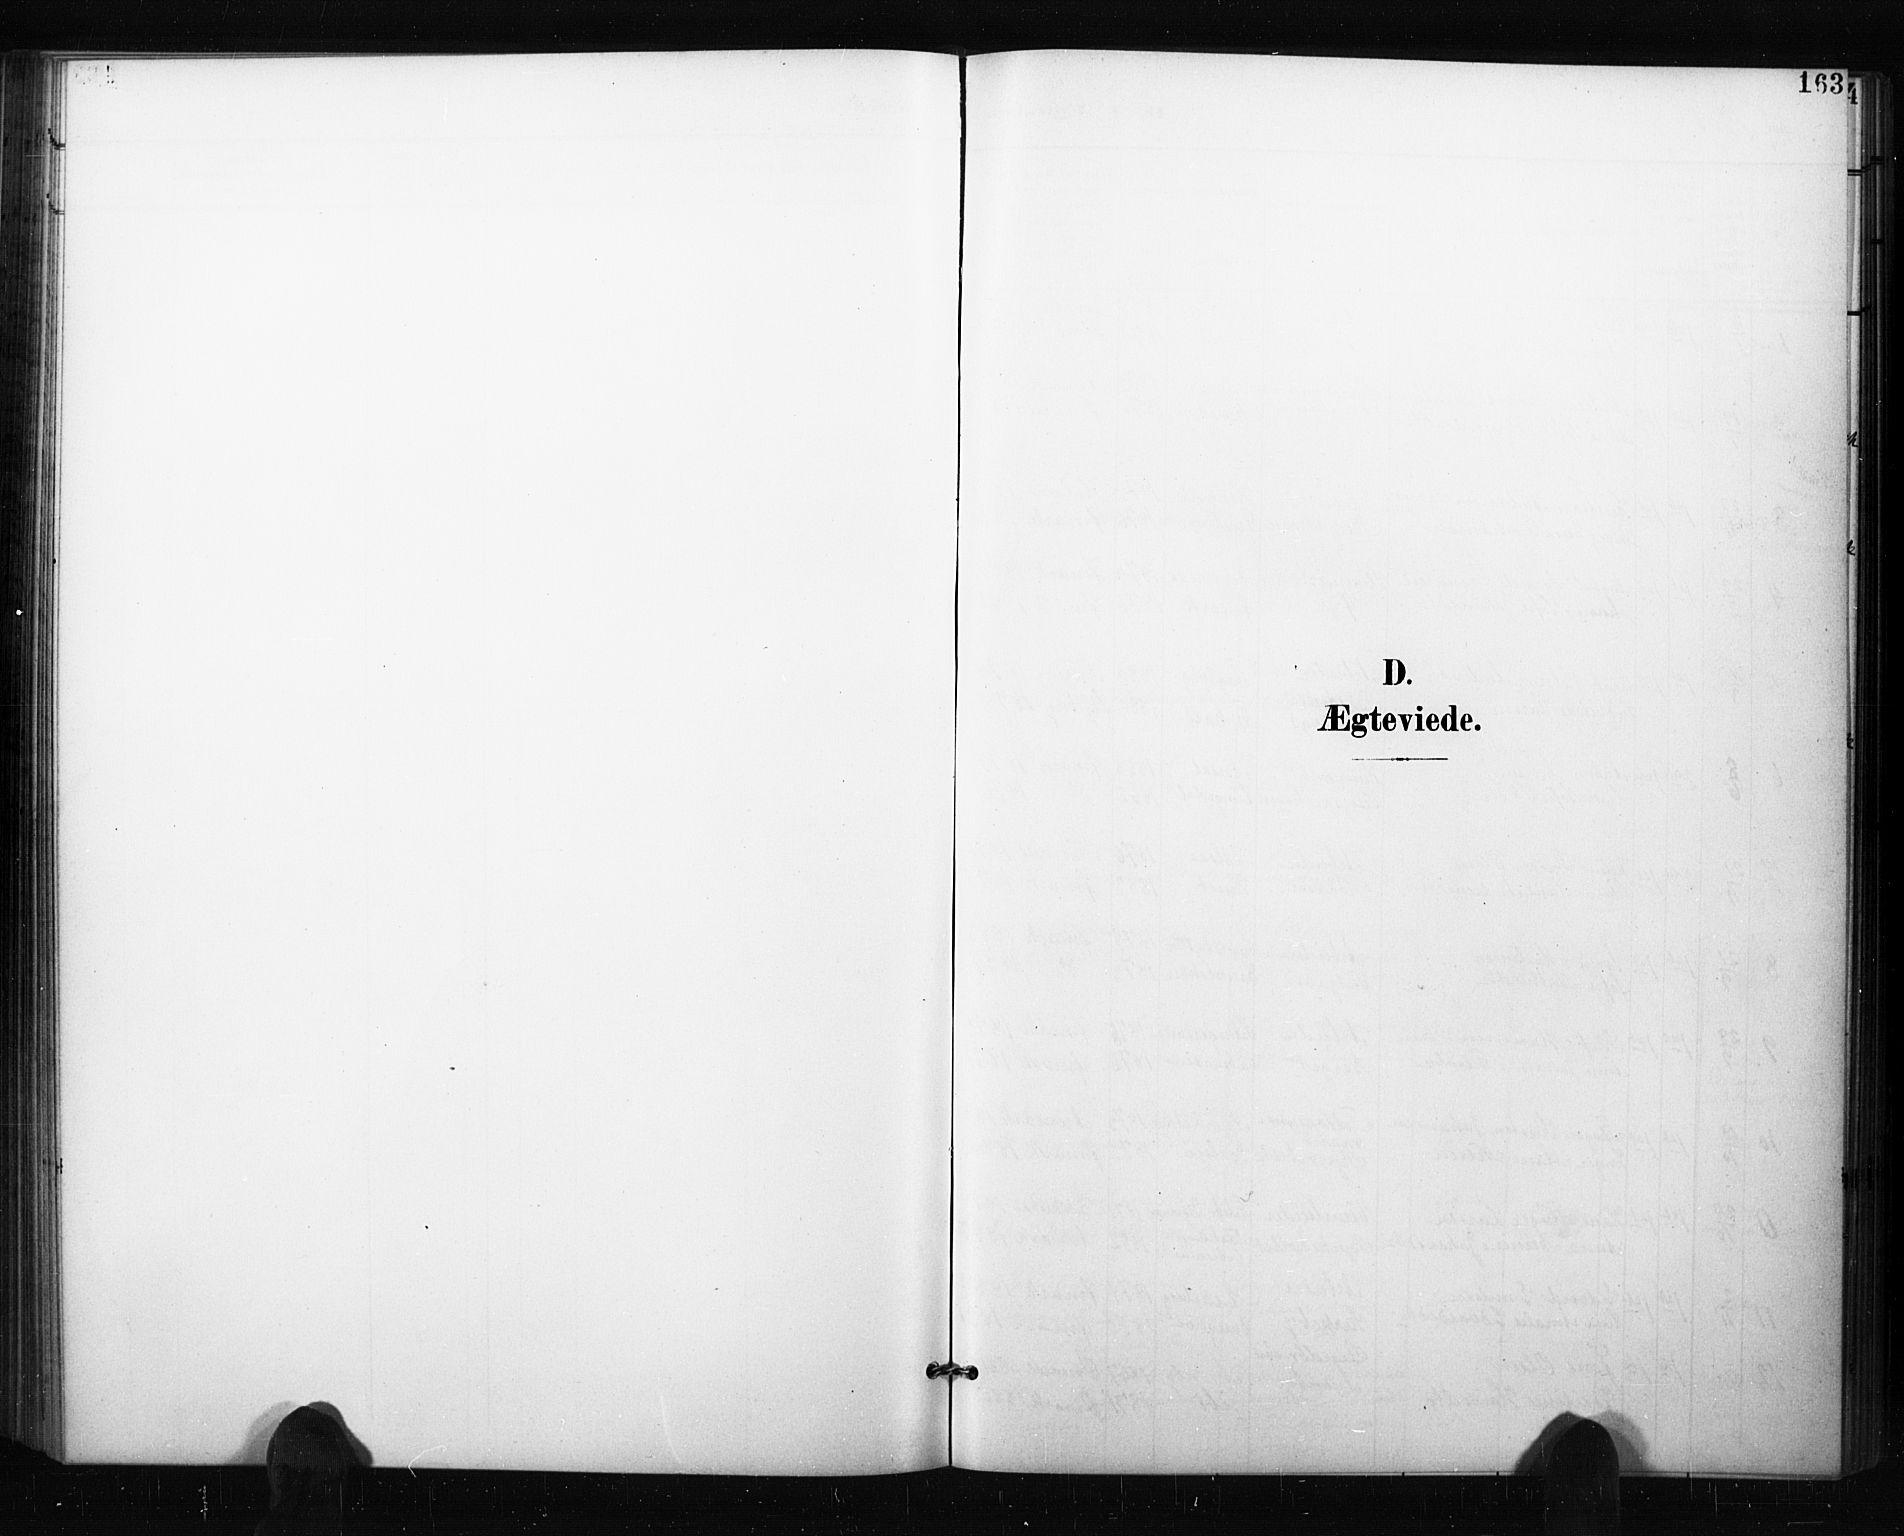 SAO, Aremark prestekontor Kirkebøker, G/Gb/L0001: Klokkerbok nr. II 1, 1901-1927, s. 163